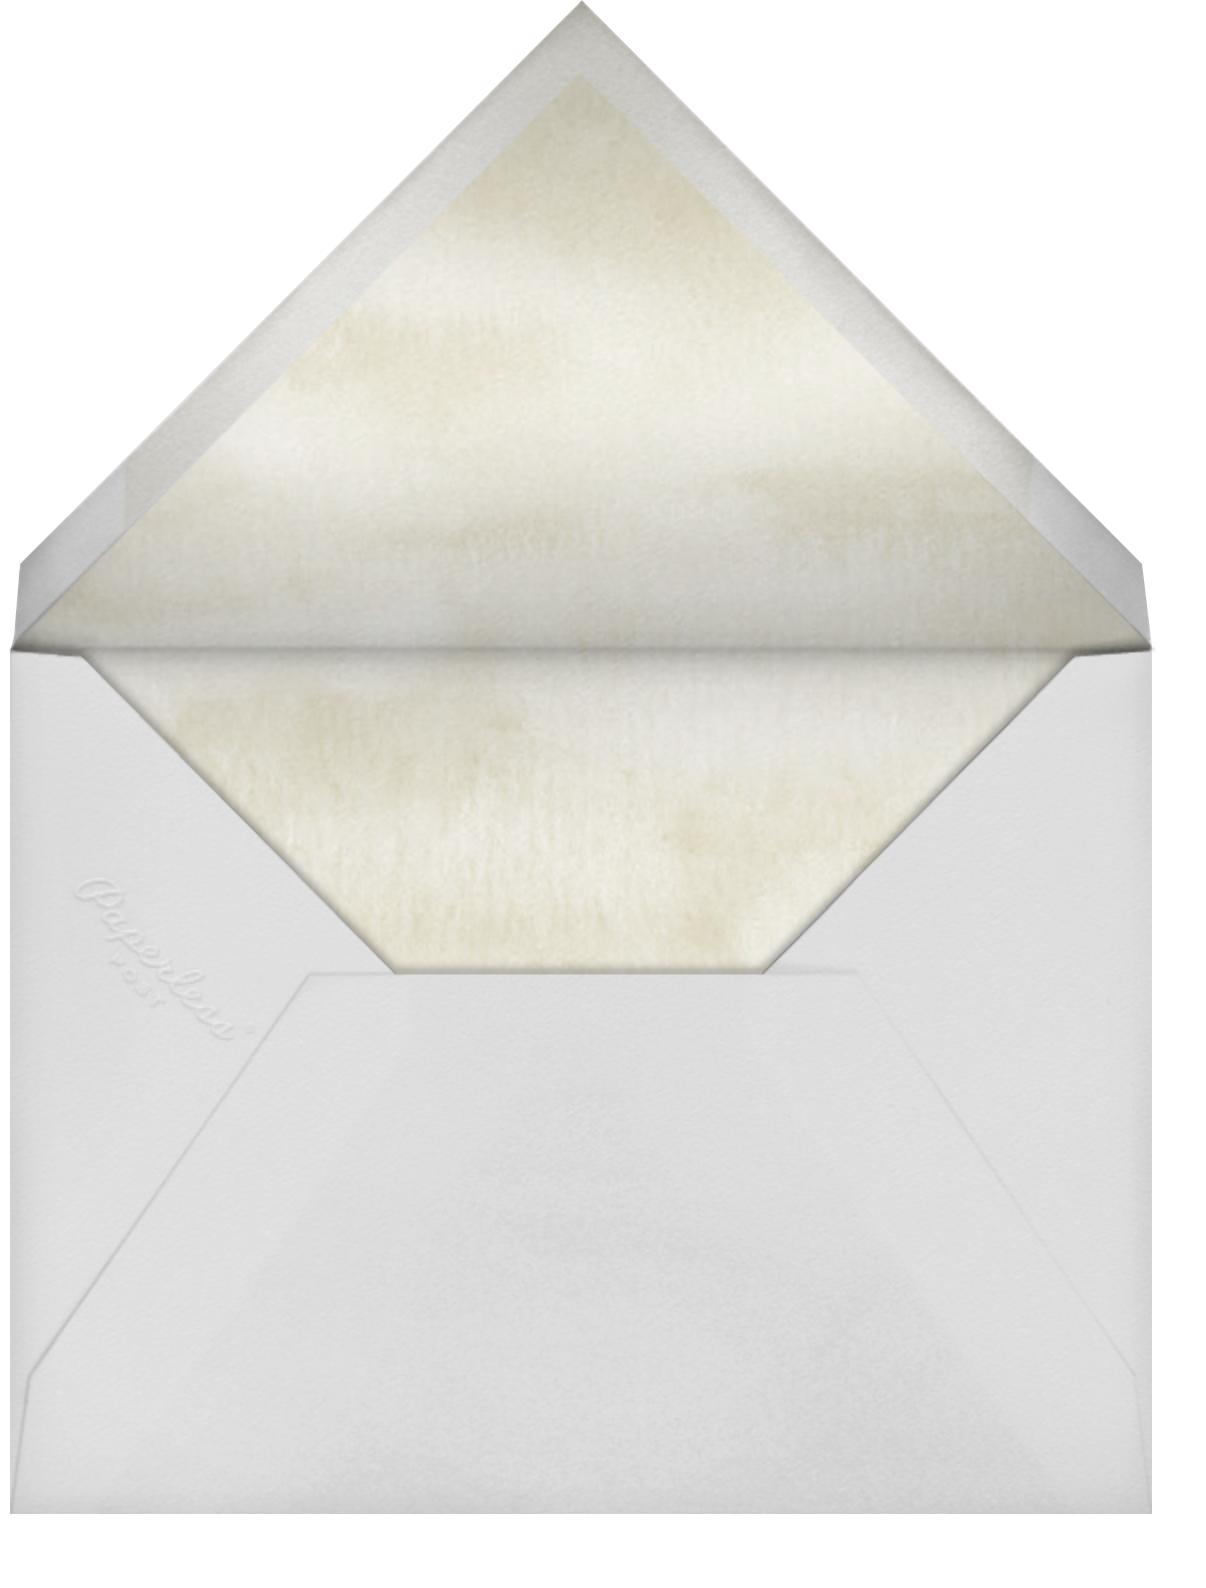 Magnolia Branches - Felix Doolittle - Mother's Day - envelope back